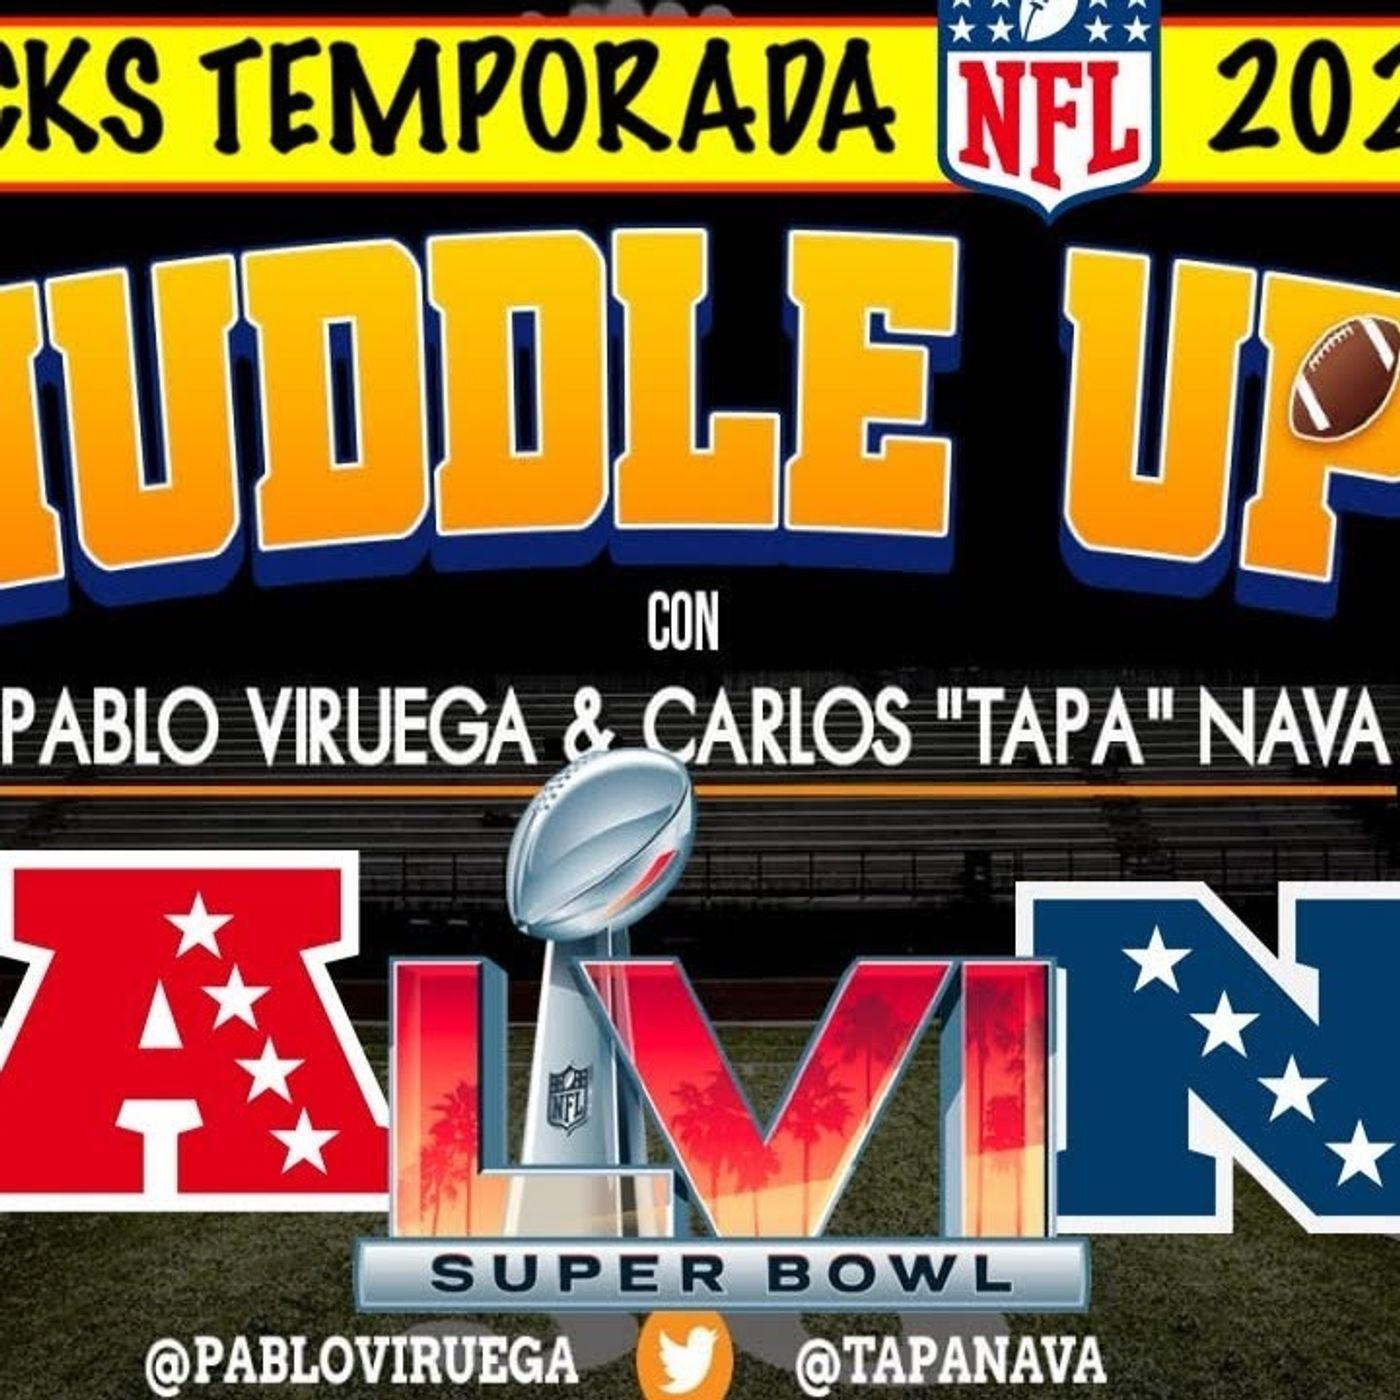 #HuddleUP Pronósticos #NFL 2021 Ganador Super Bowl con @TapaNava y @PabloViruega